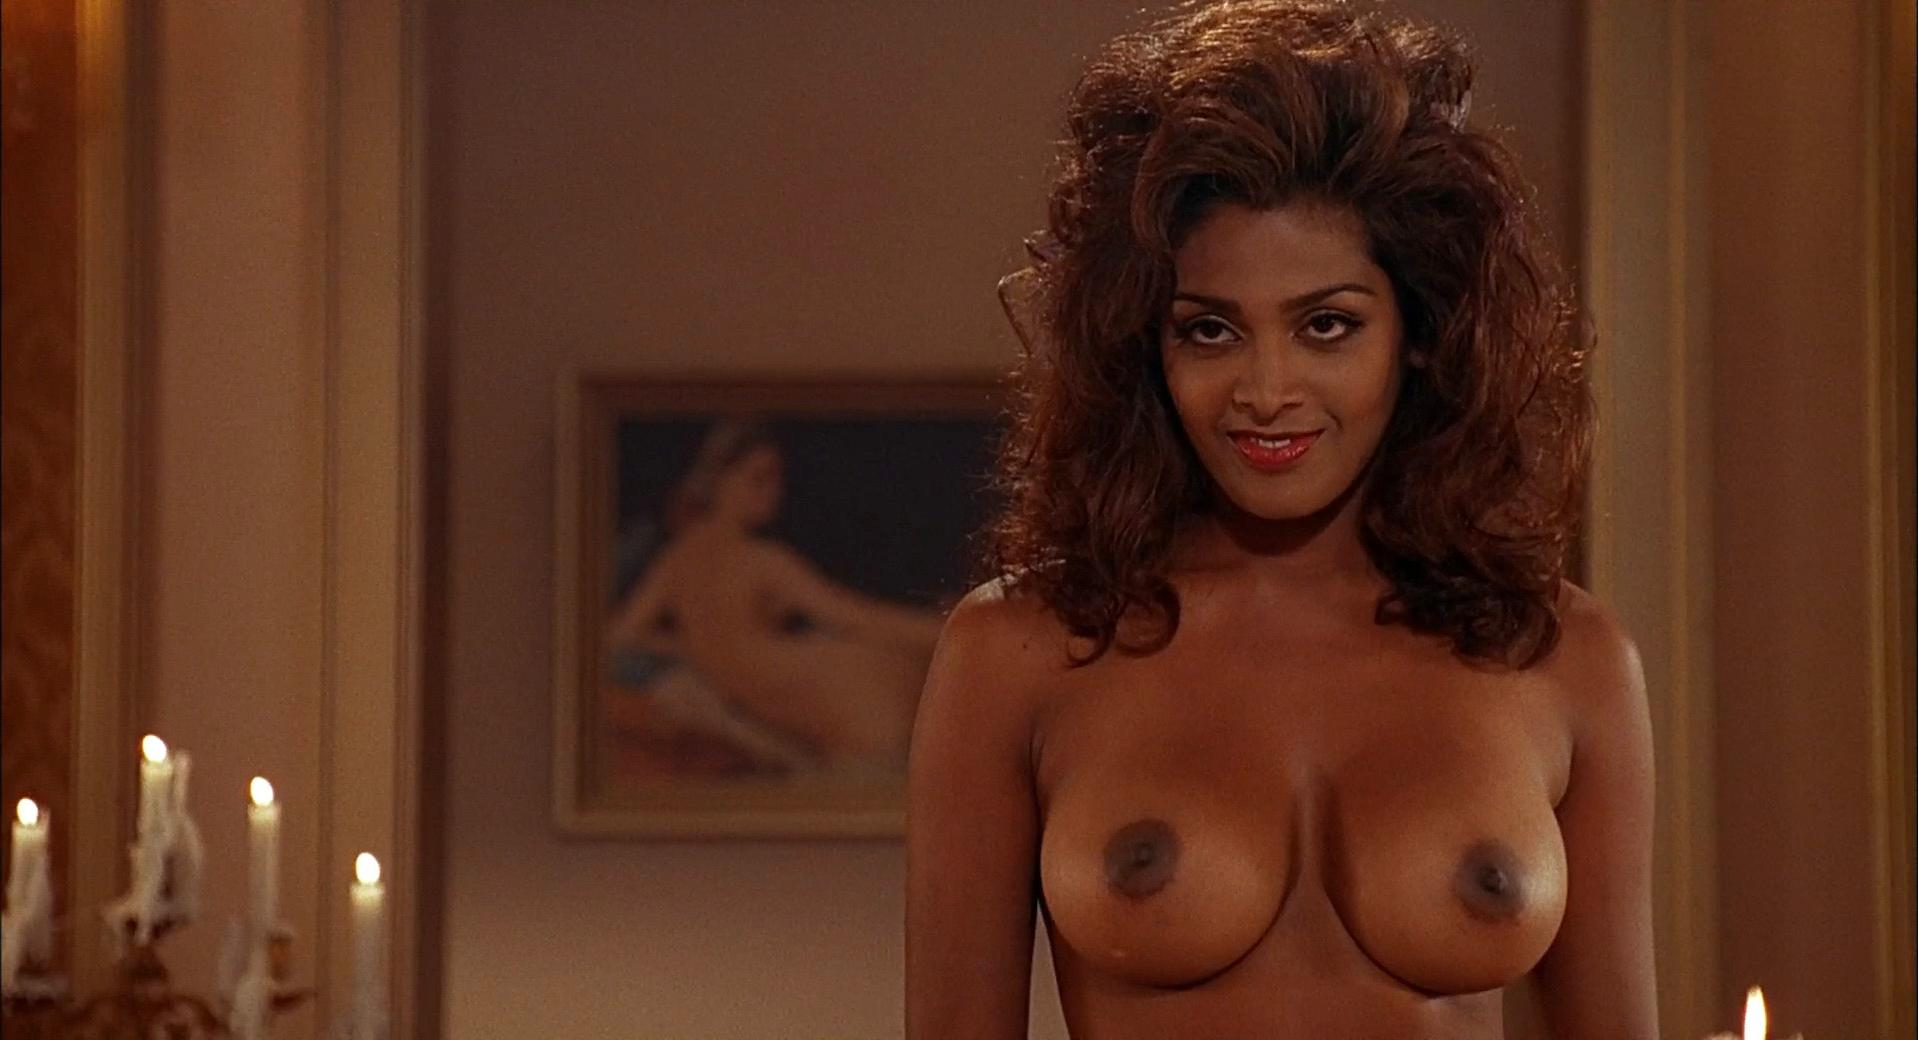 Lexy black